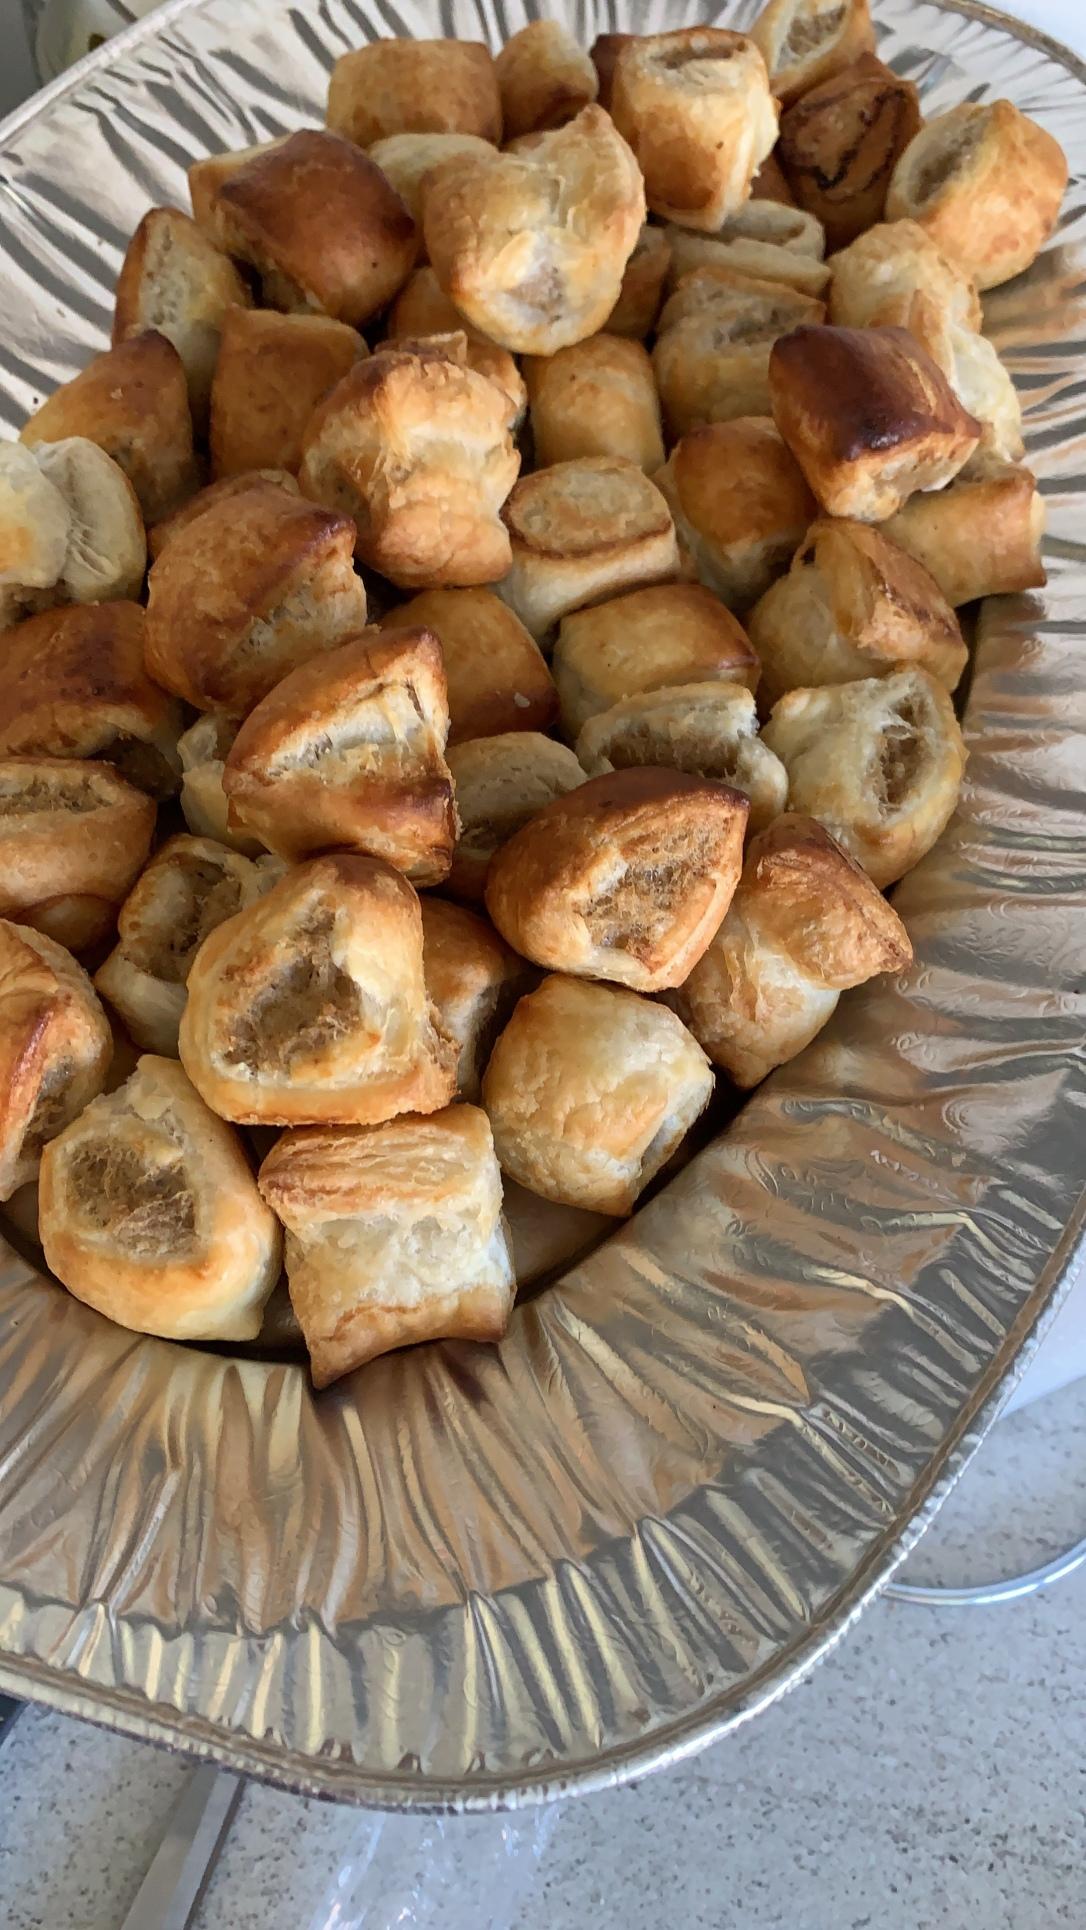 Platter of sausage rolls